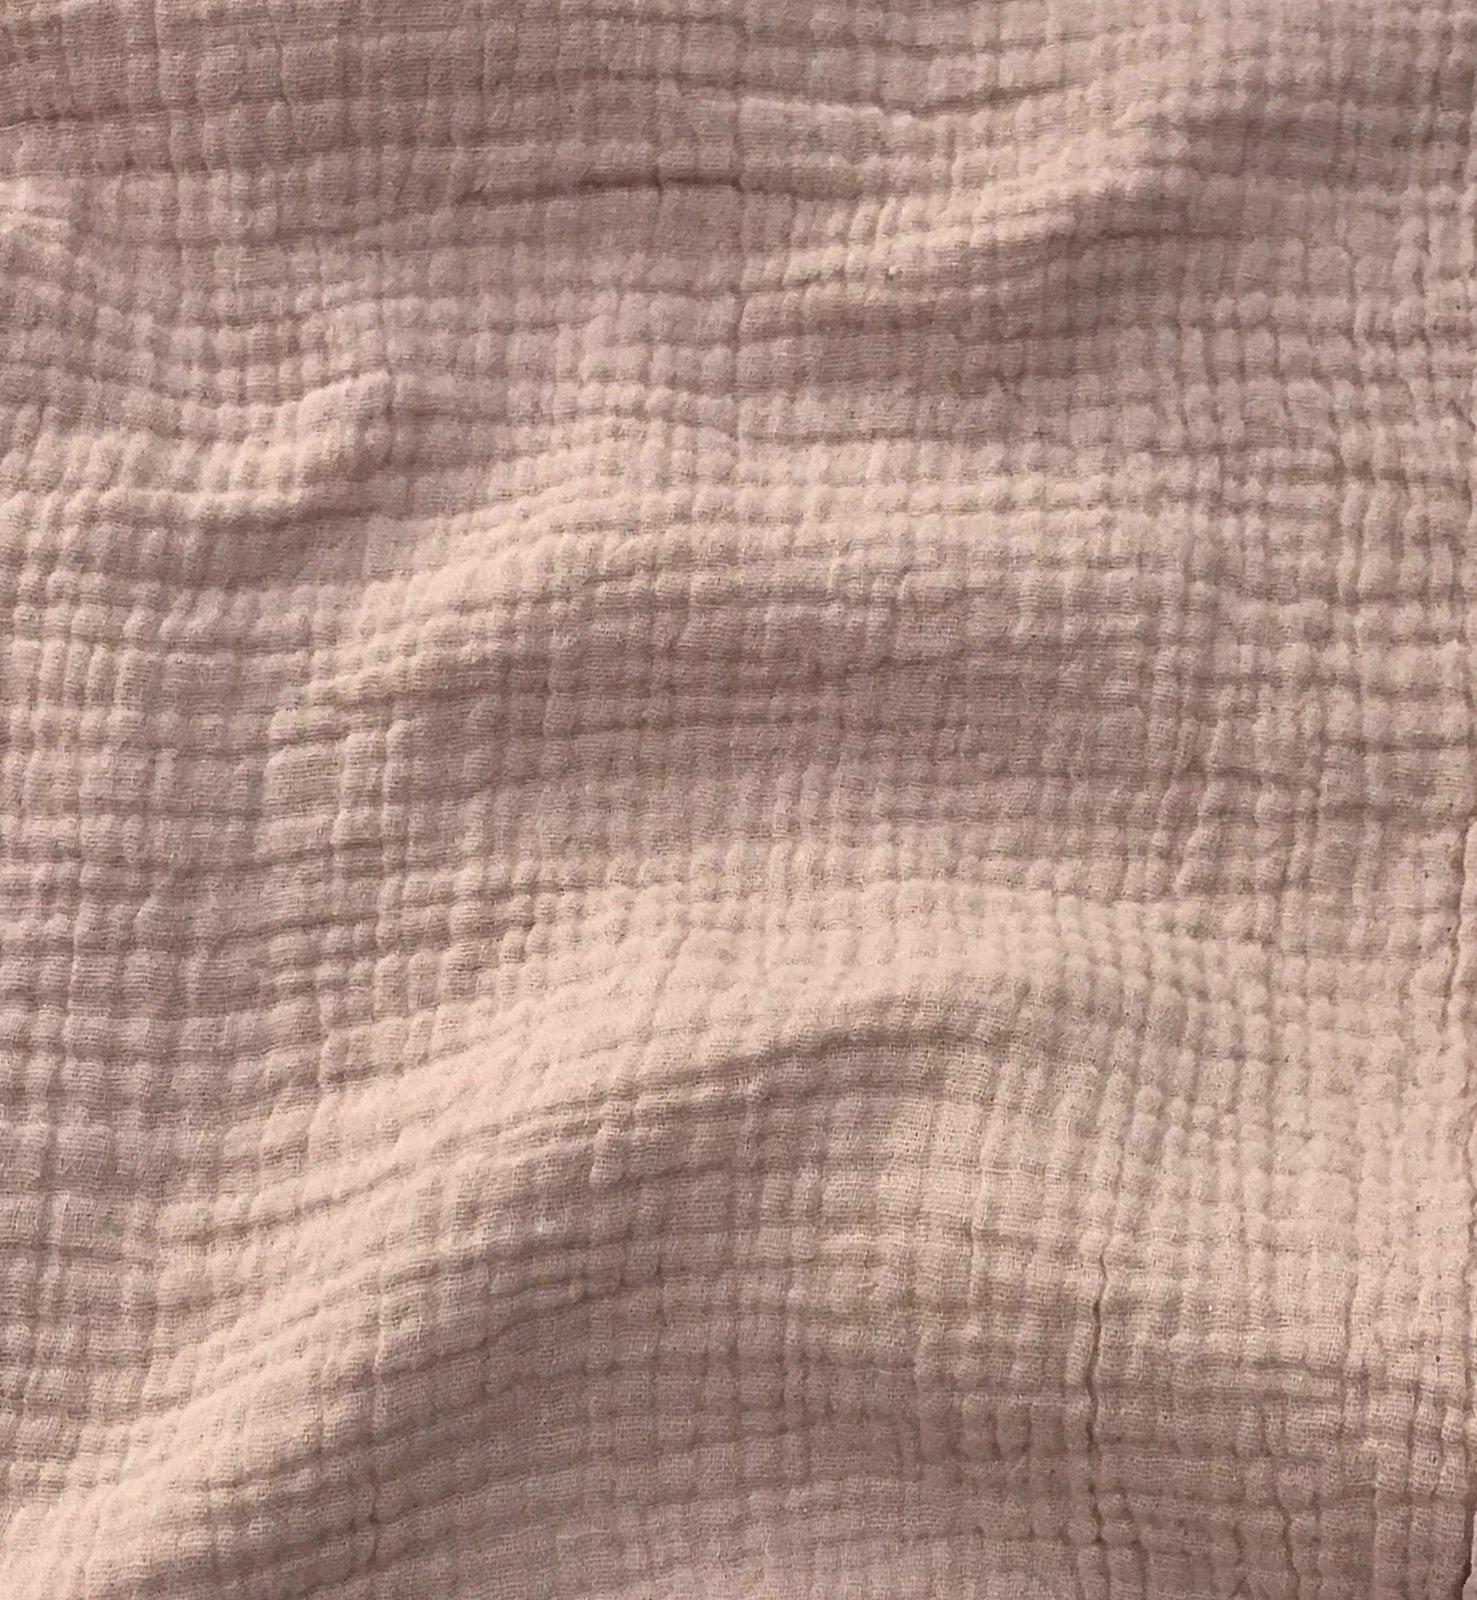 *Four Featured Fabrics: Cotton Double Gauze - Blush